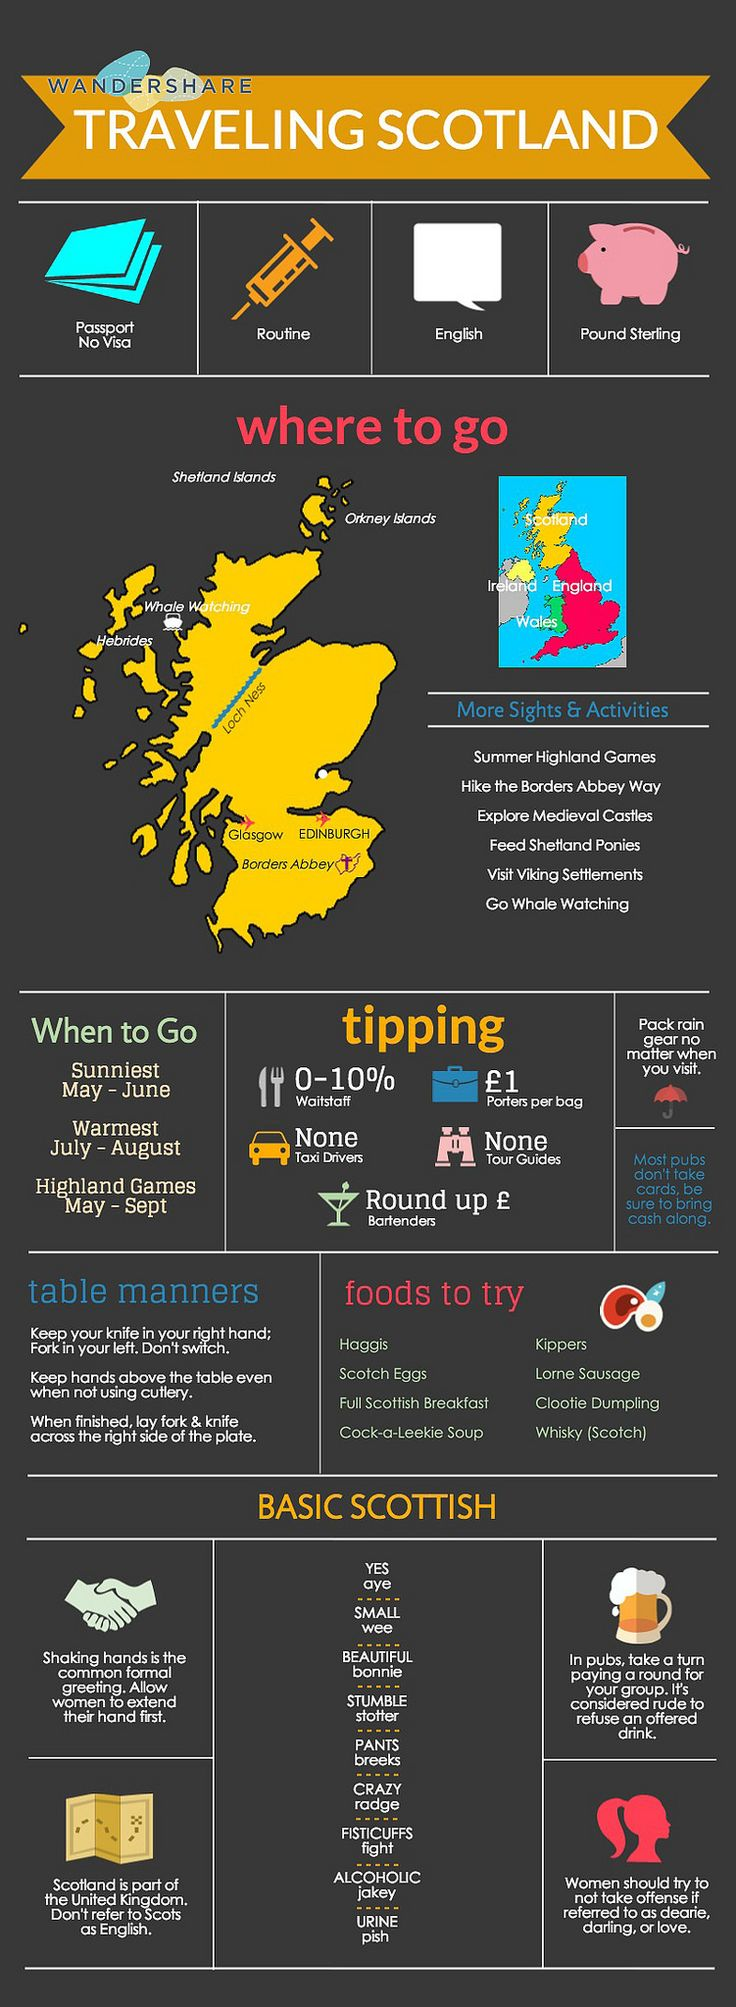 https://flic.kr/p/qGV2zU   Wandershare.com - Traveling Scotland